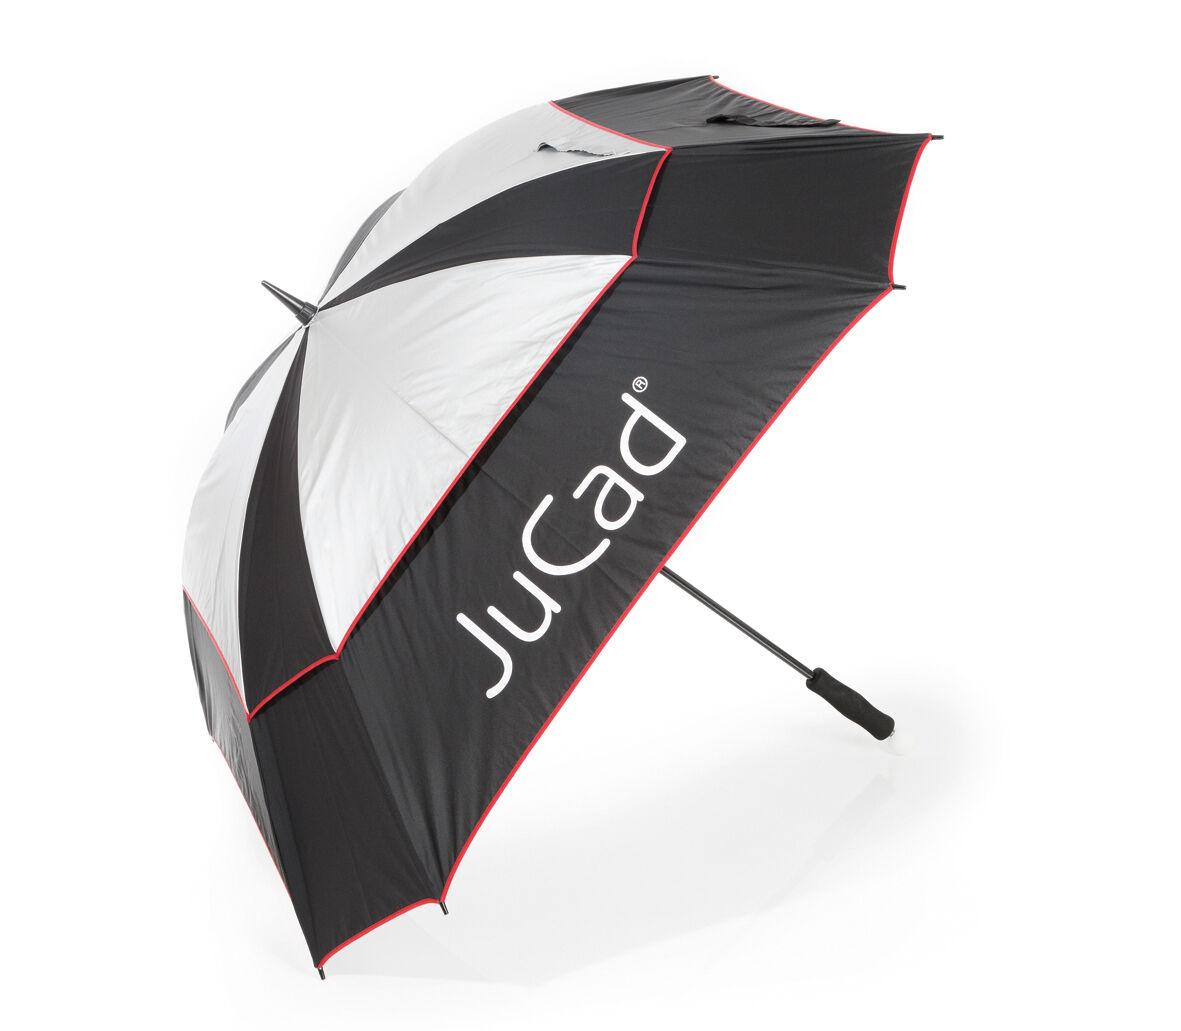 Jucad ® paraguas windproof negro plata rojo nuevo VK  95,-